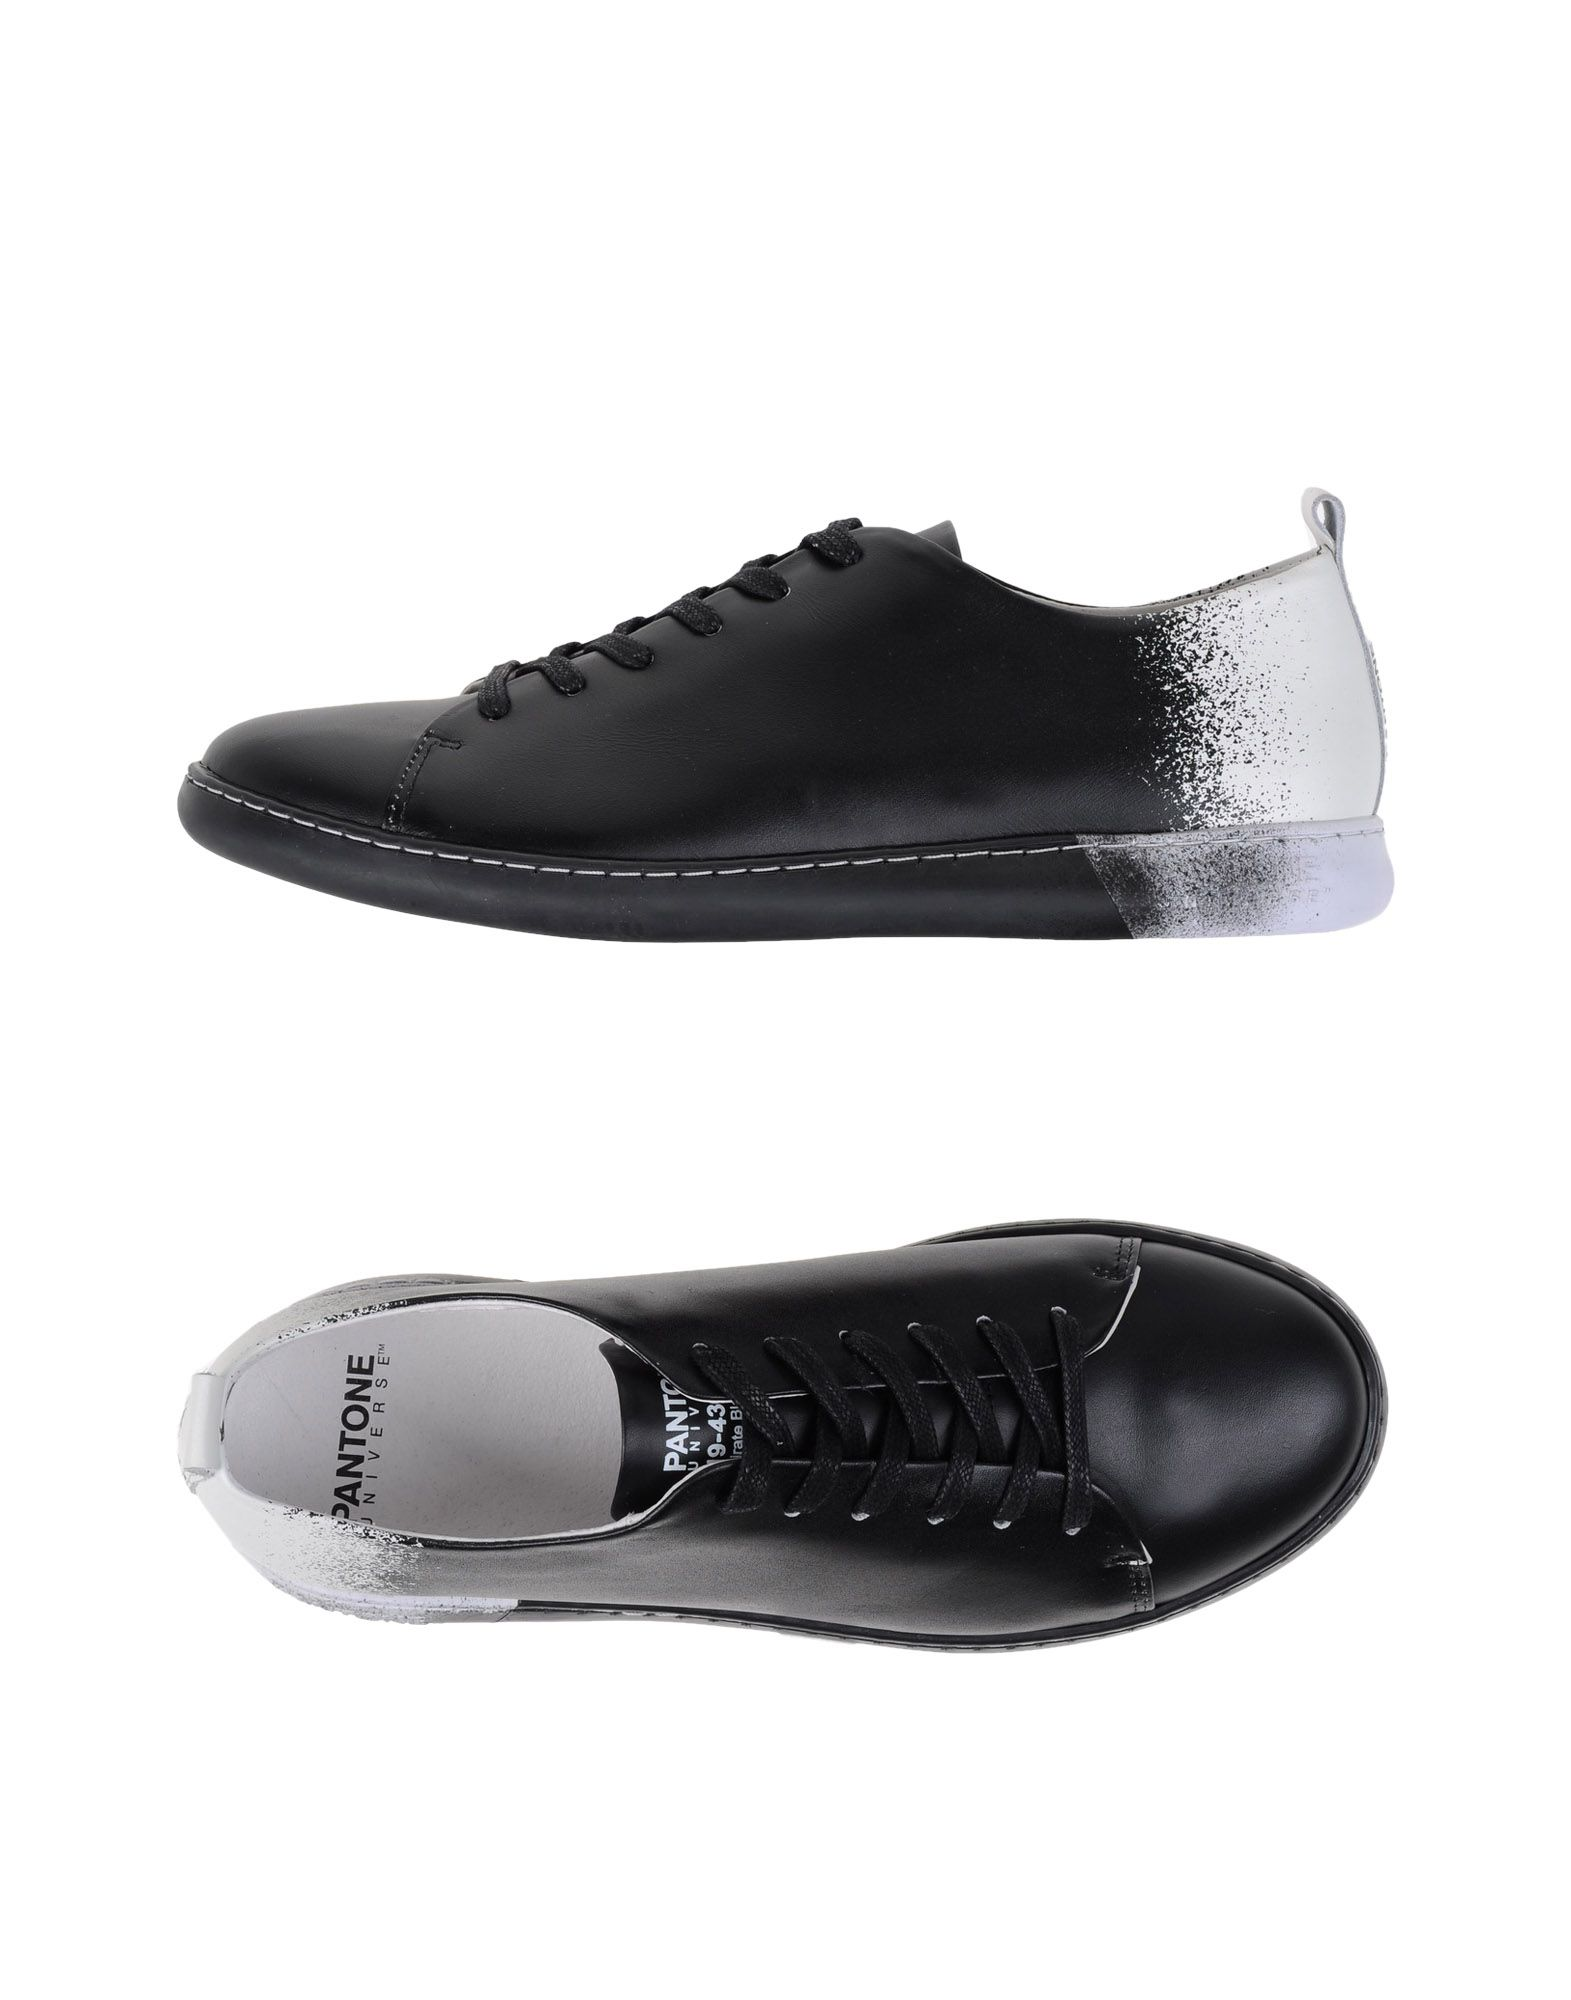 Scarpe da Nyc Ginnastica Pantone Universe Footwear Nyc da - Uomo - 11107566HF fba8af